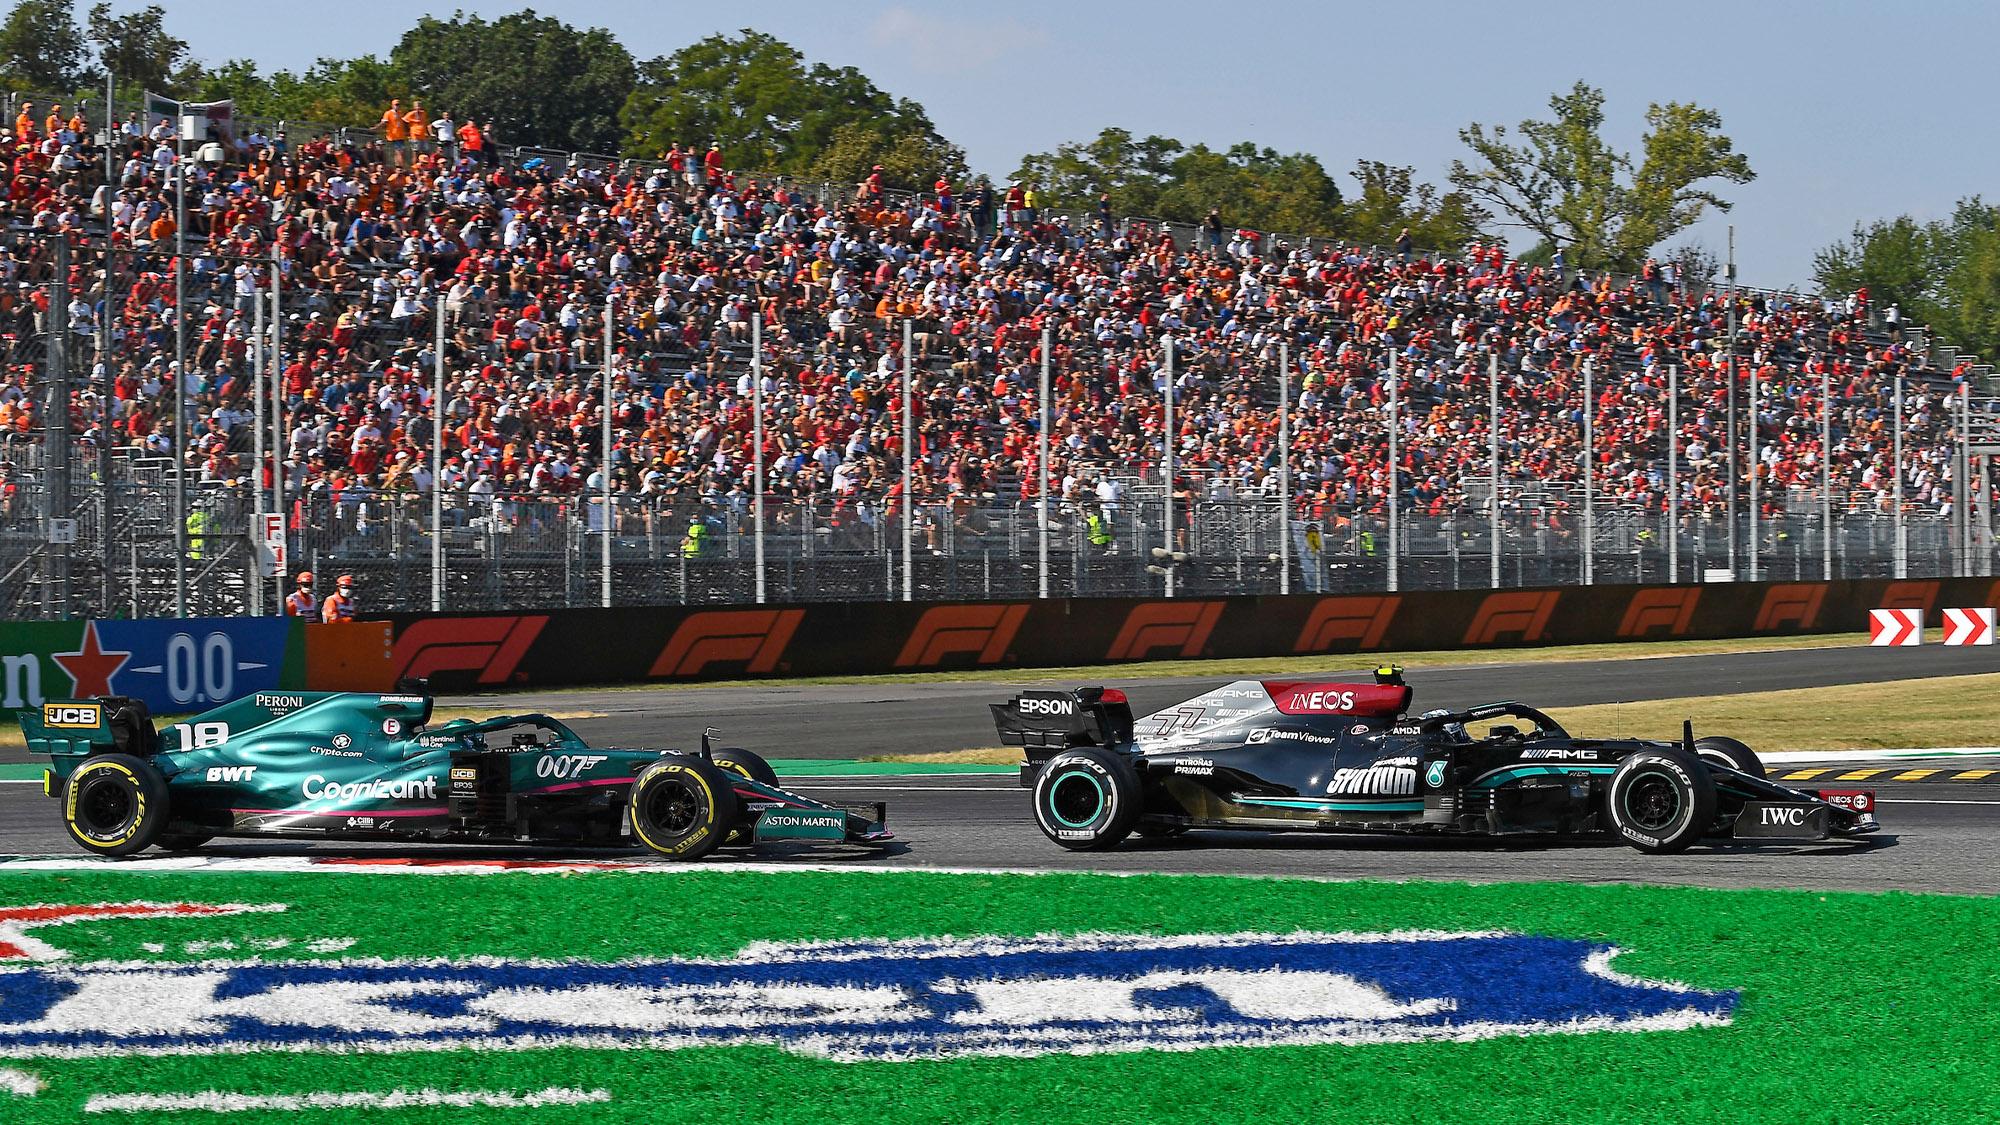 Lance Stroll behind Valtteri Bottas at the 2021 Italian Grand Prix